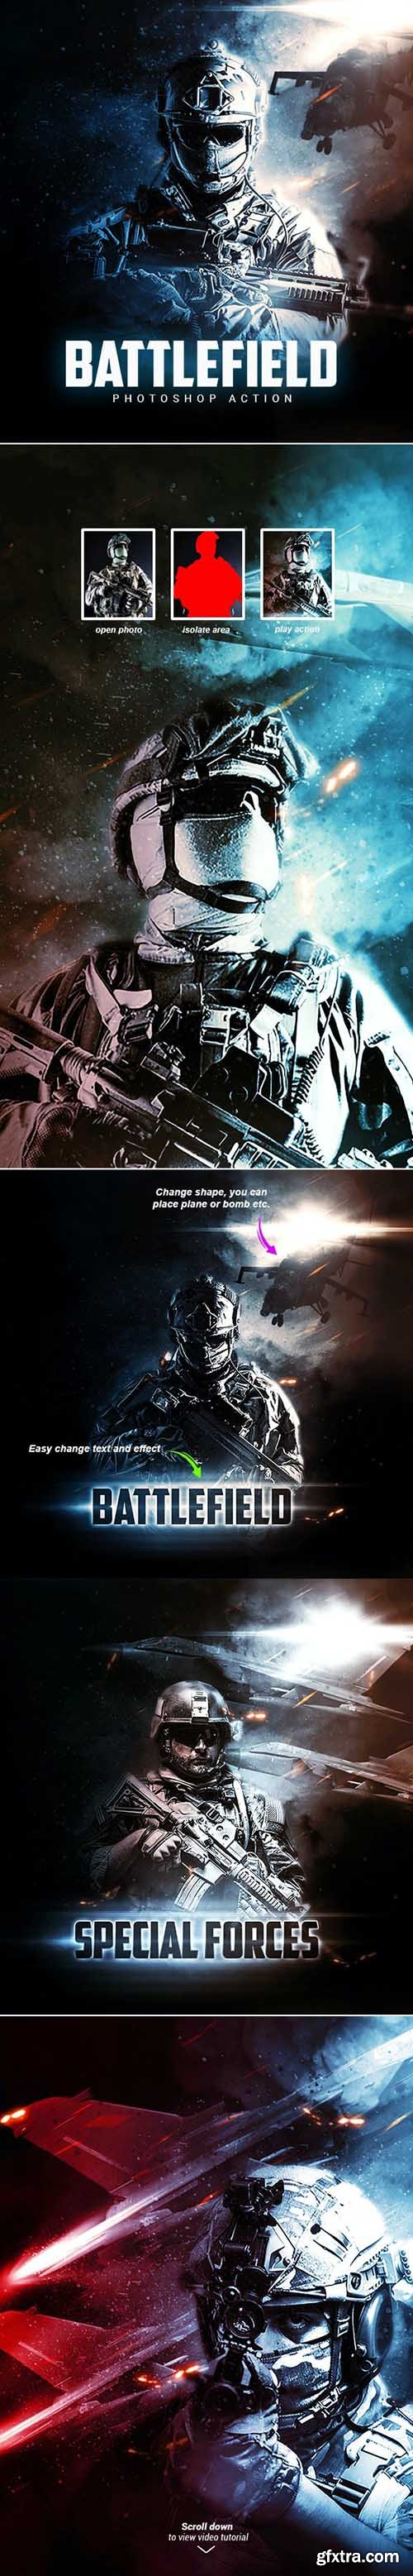 GraphicRiver - Battlefield - Photoshop Action 32973251